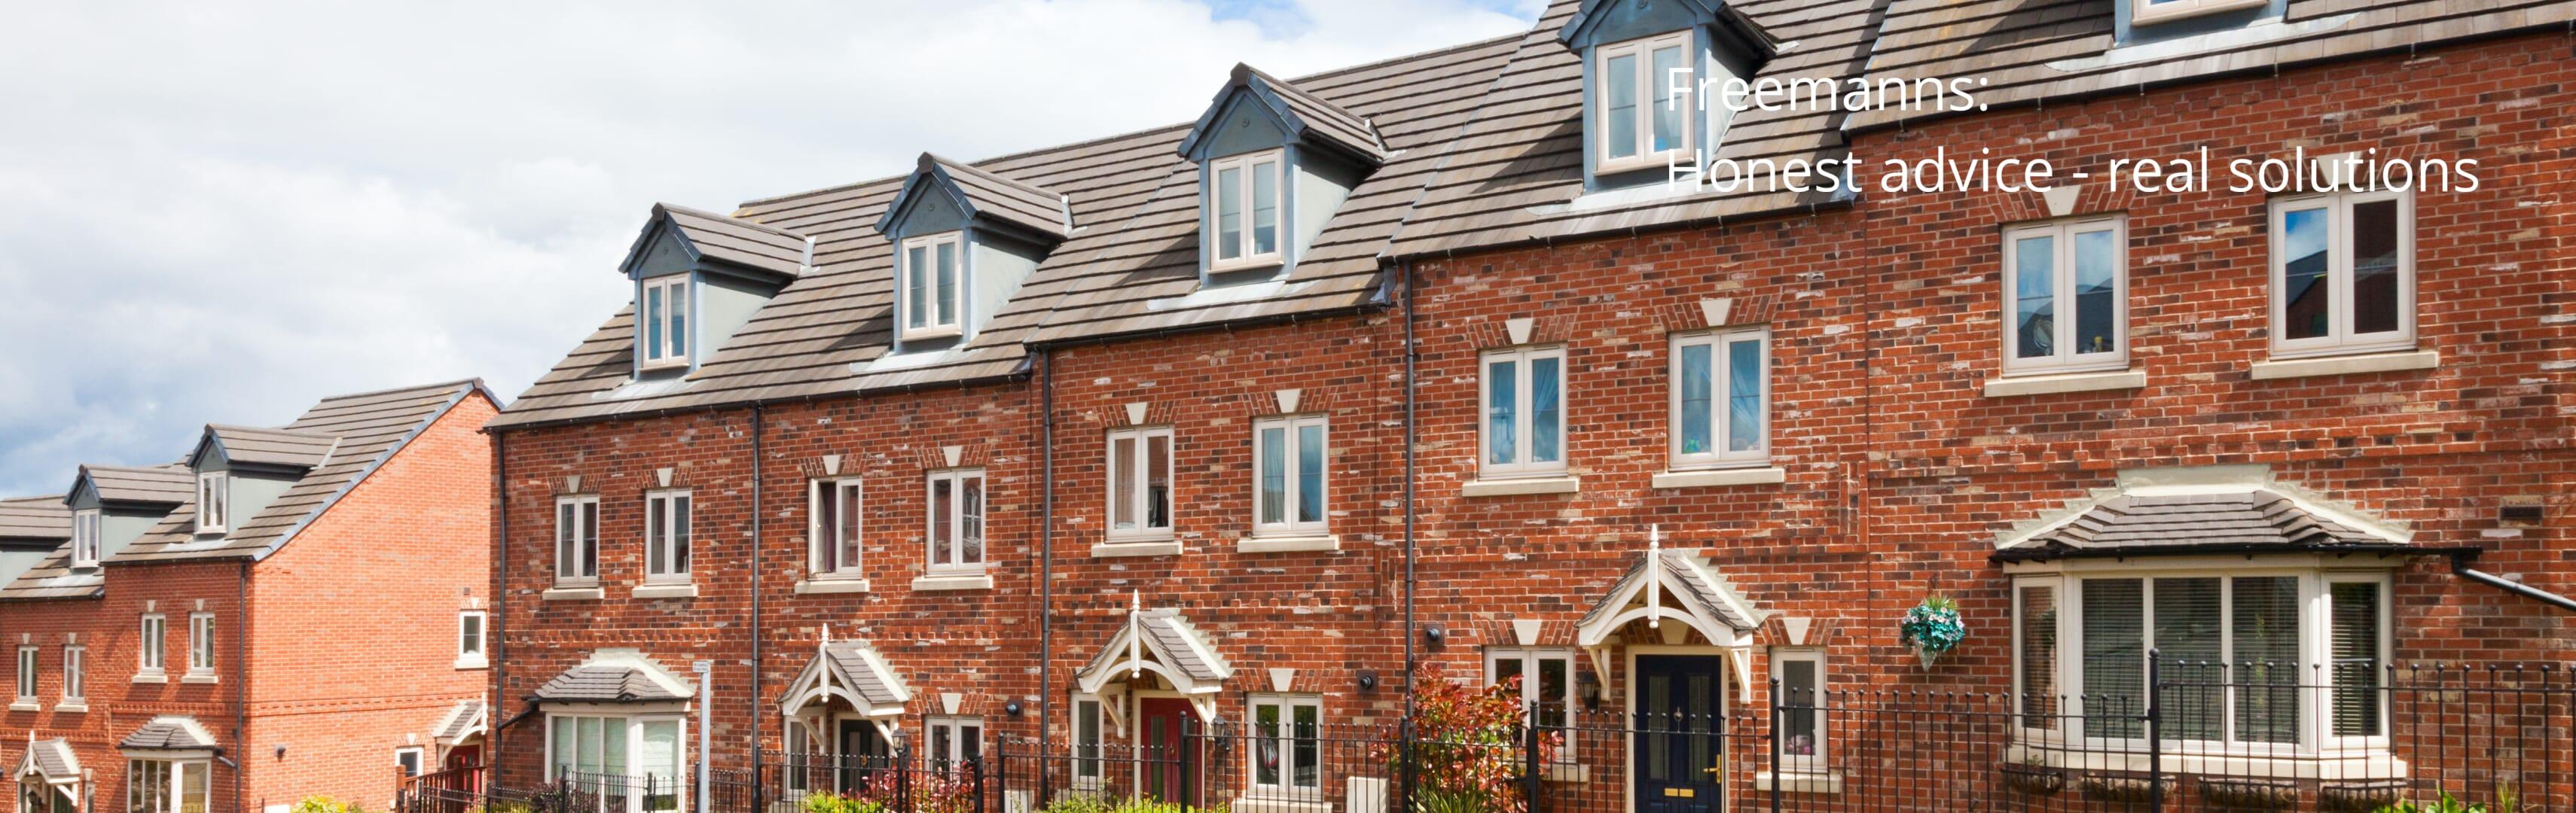 Rental Property disputes resolution